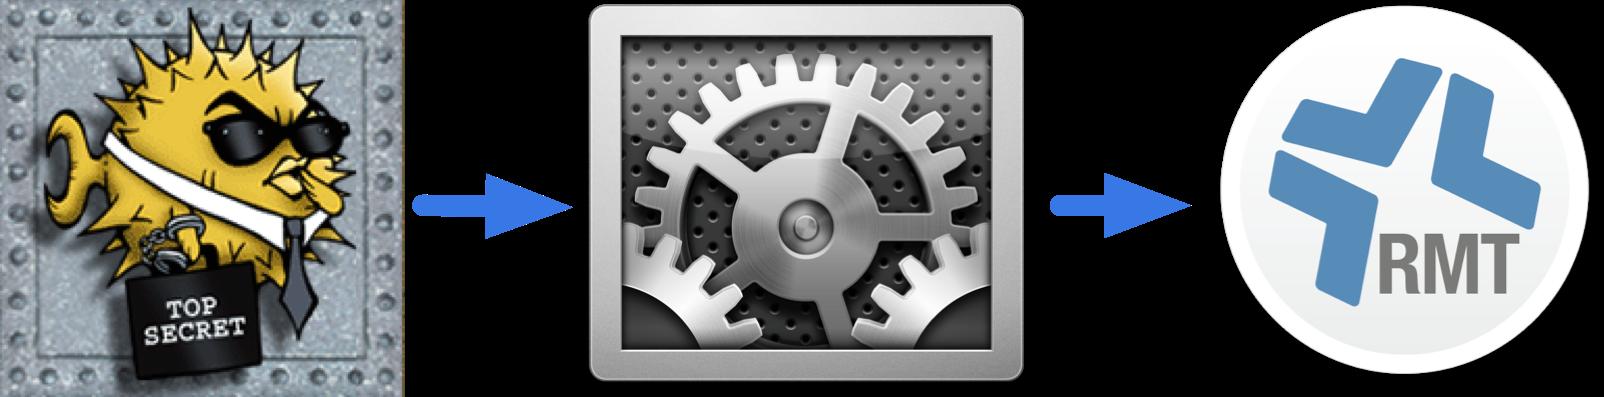 casper remote custom ssh port